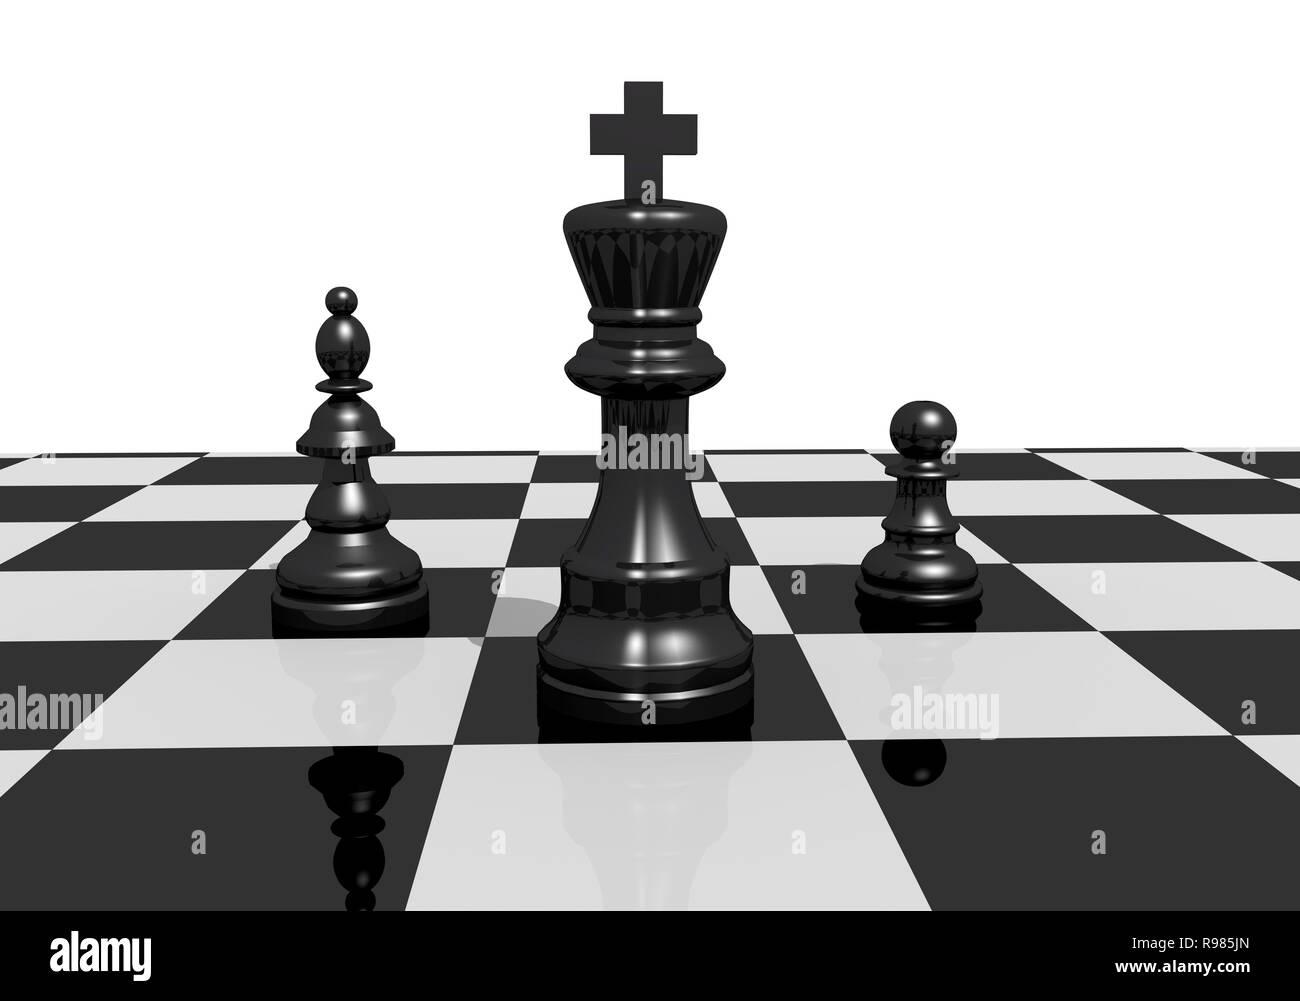 chess pawn chessmen boardgame figures 3d illustration - Stock Image